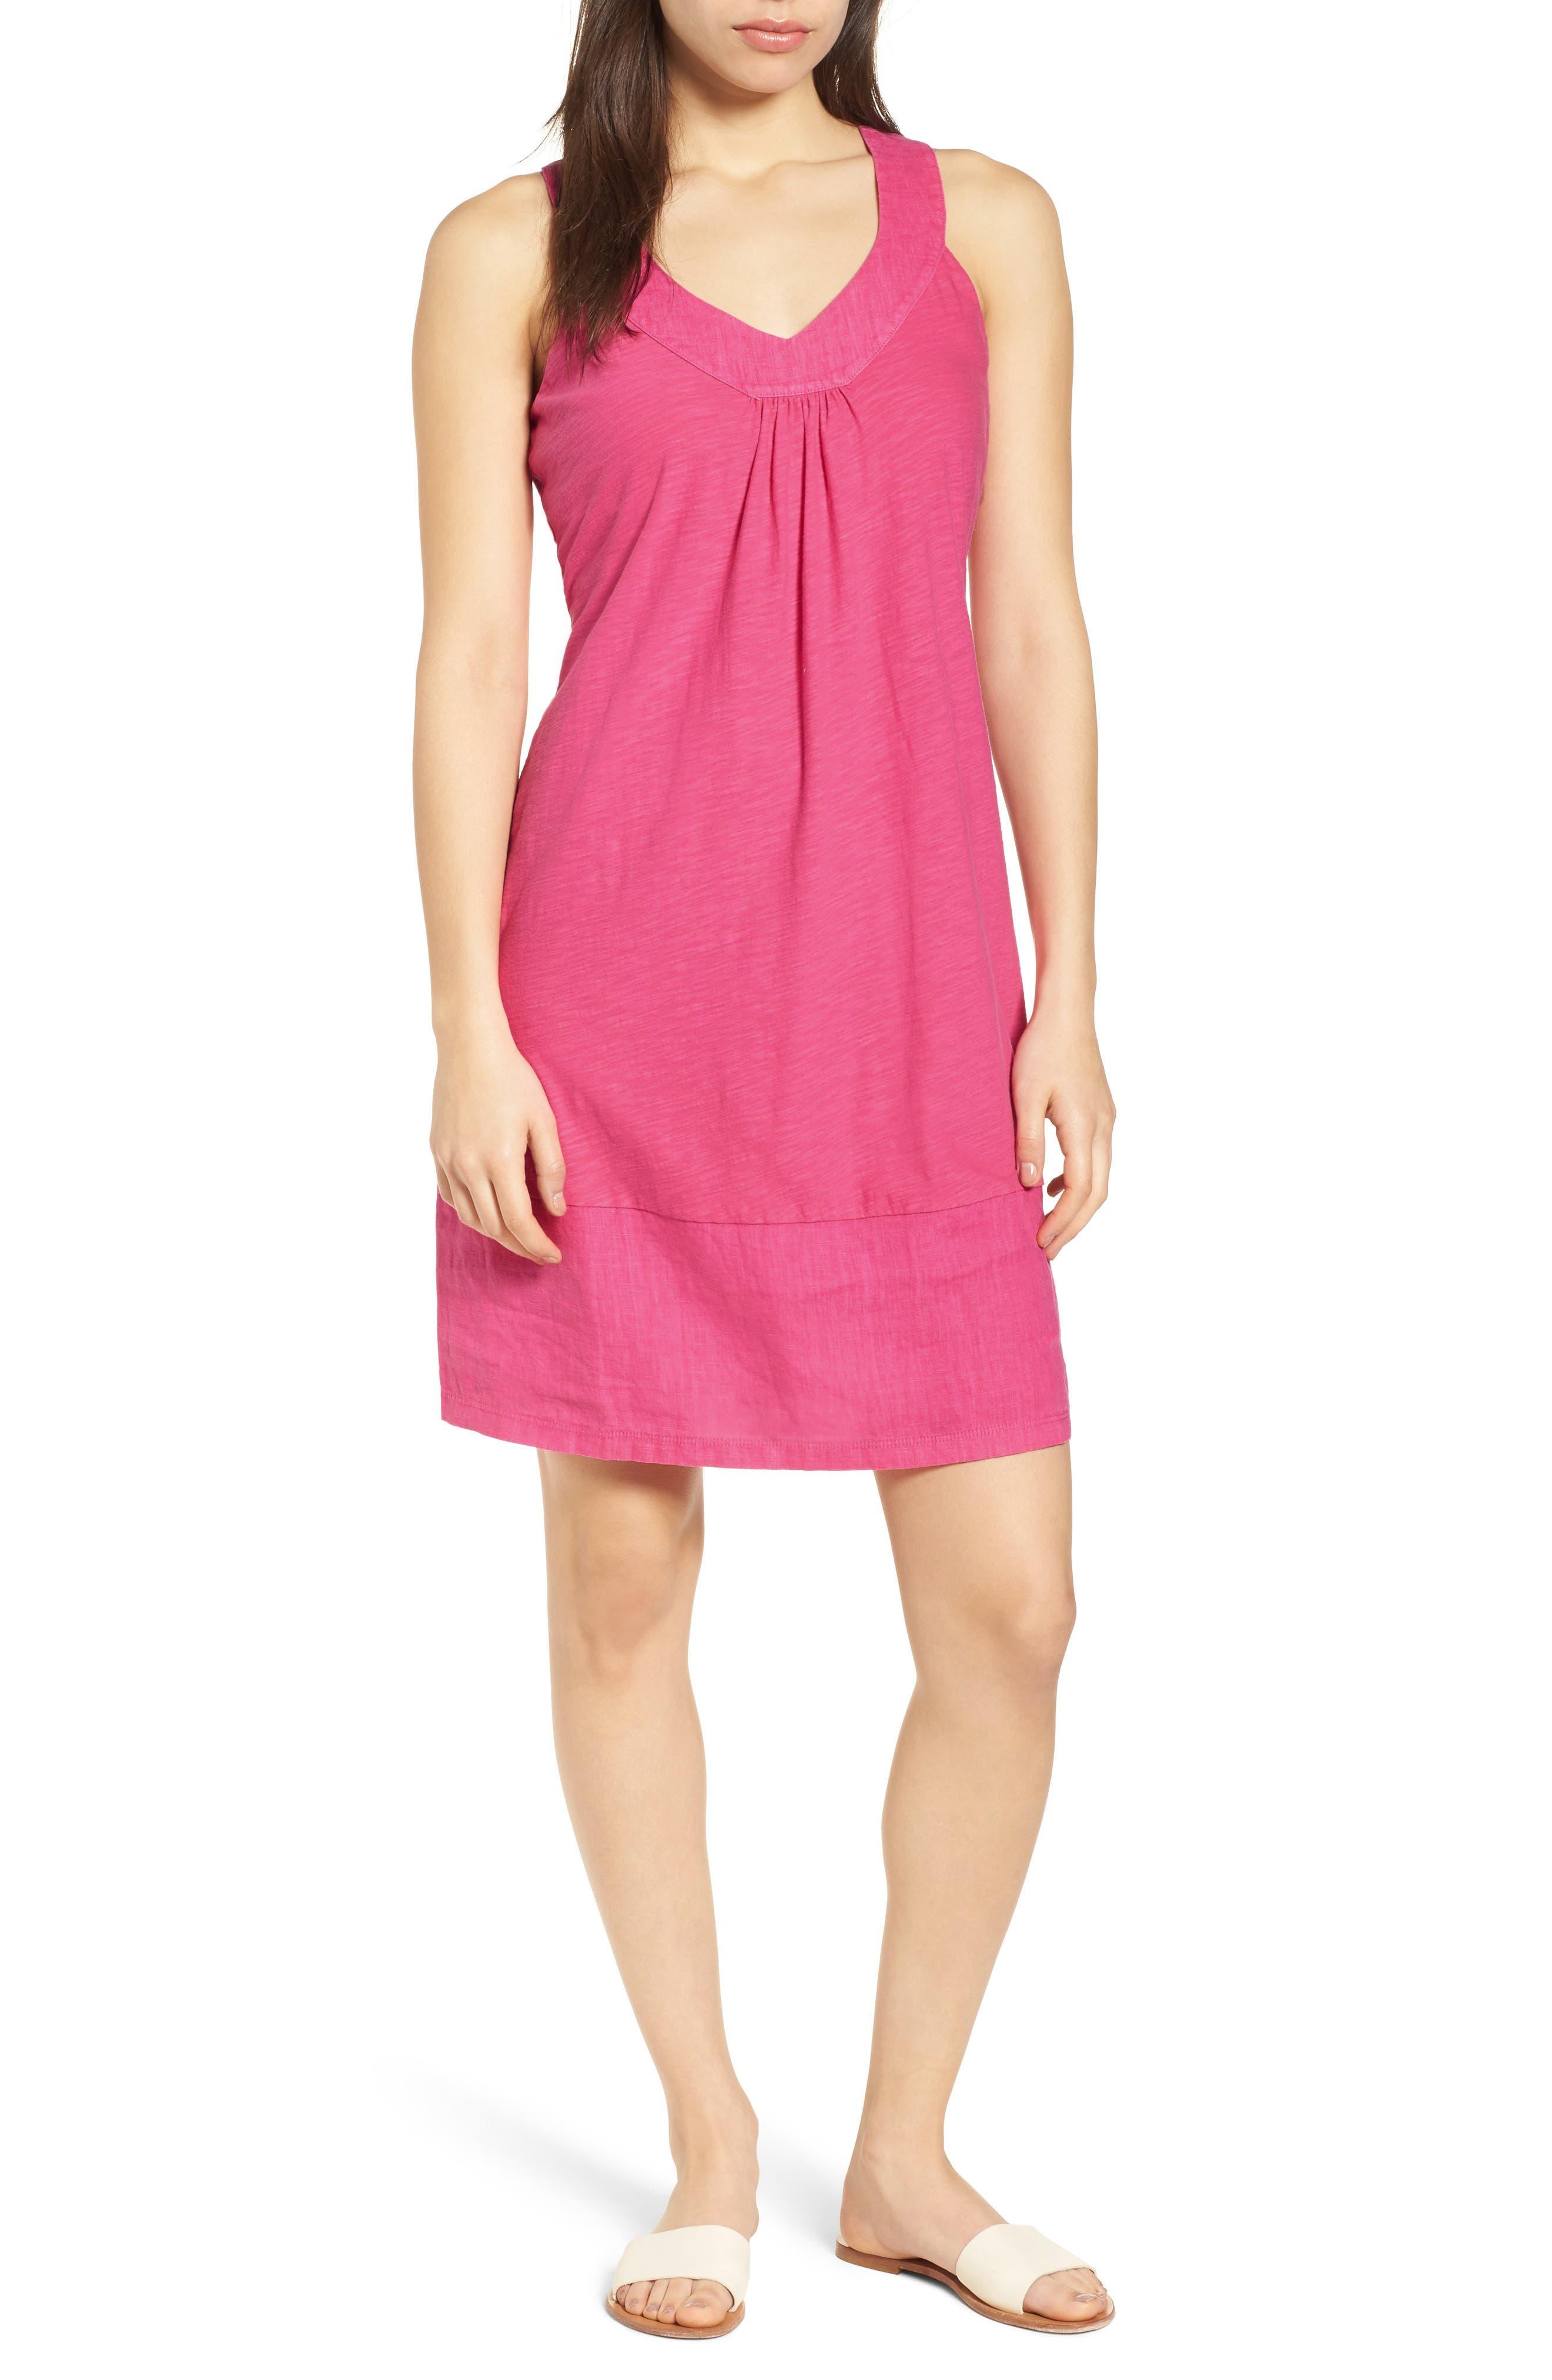 Arden Shift Dress,                             Main thumbnail 1, color,                             Bright Blush